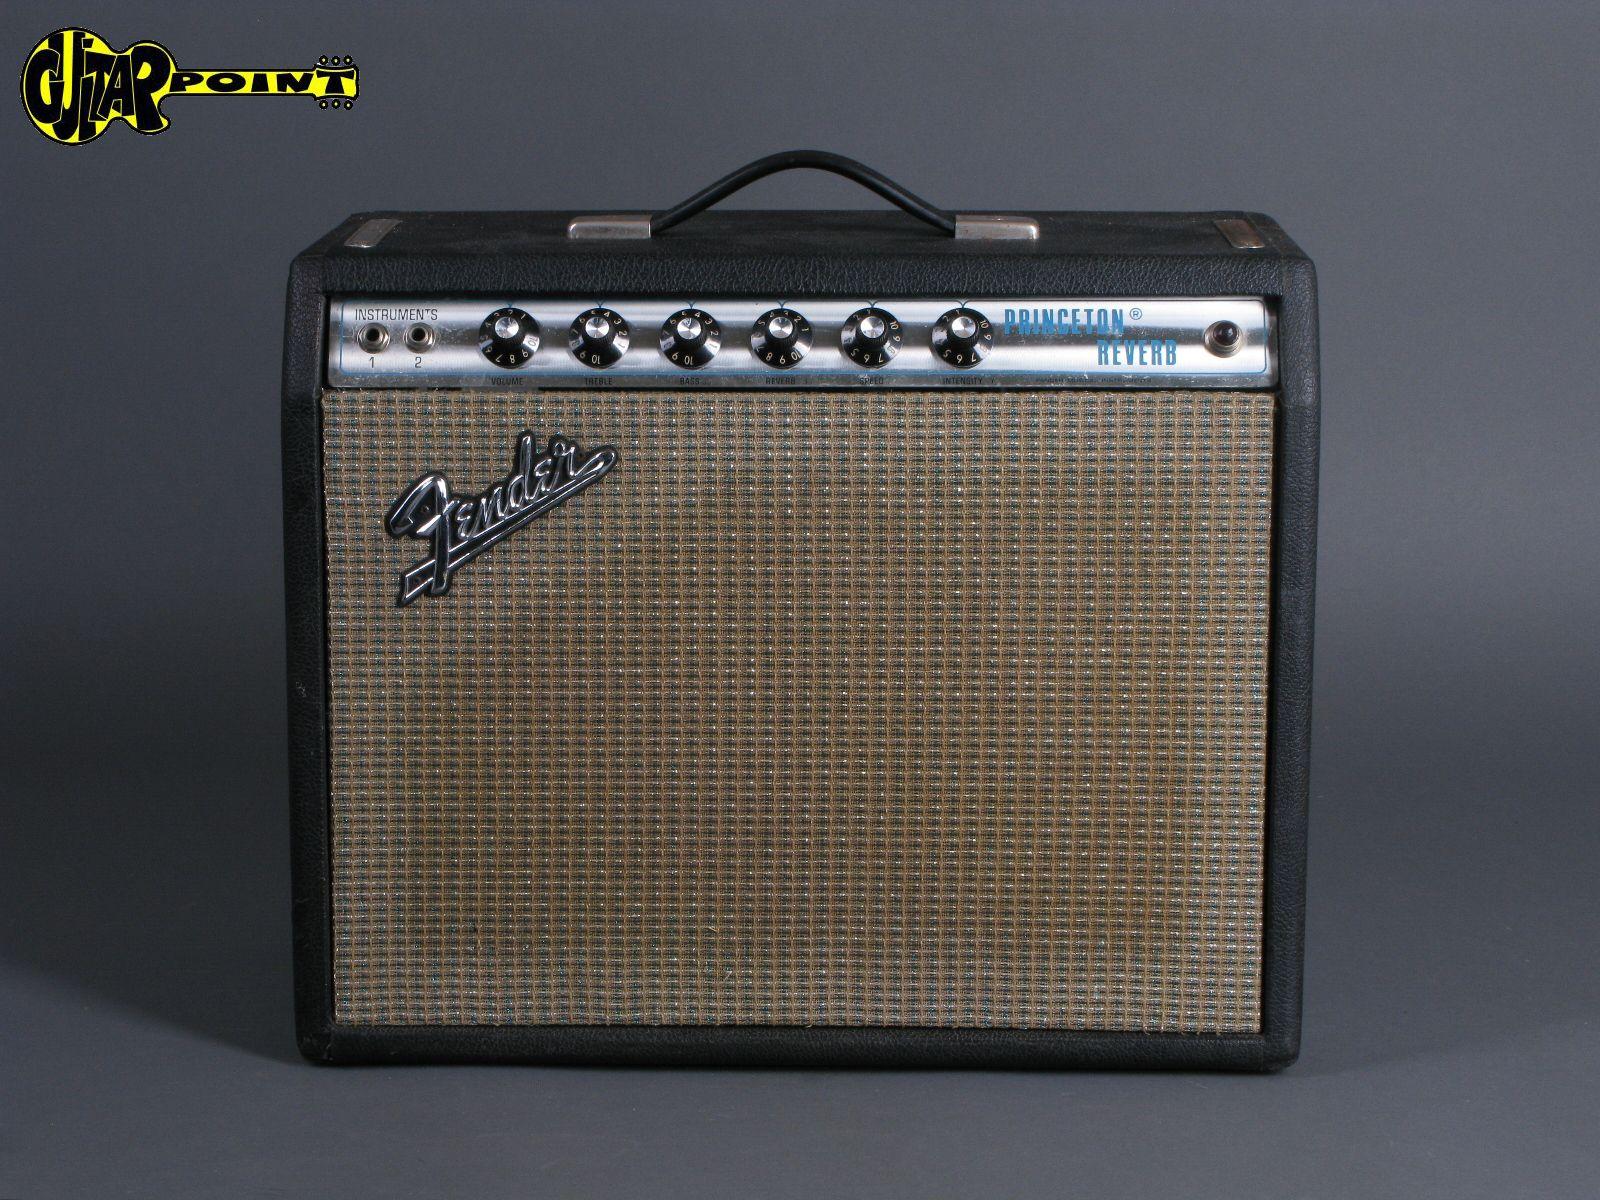 1972 Fender Princeton Reverb Amp